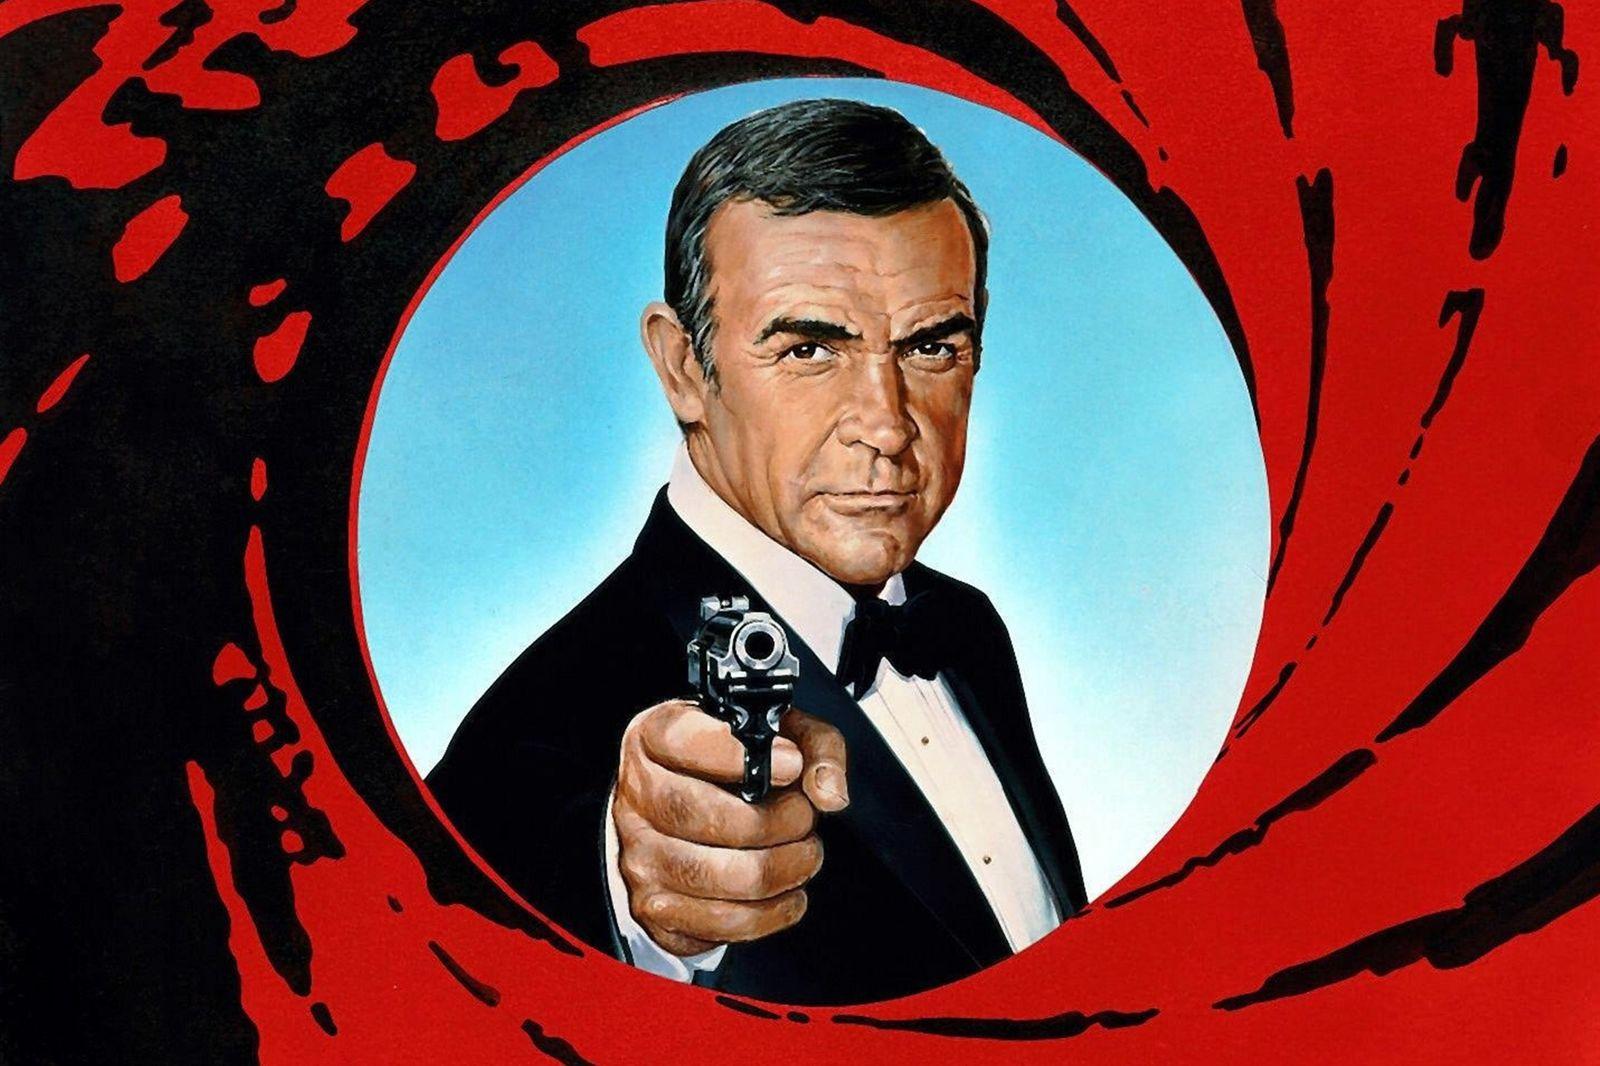 Bond, James - Sag niemals nie / Never Say Never Again